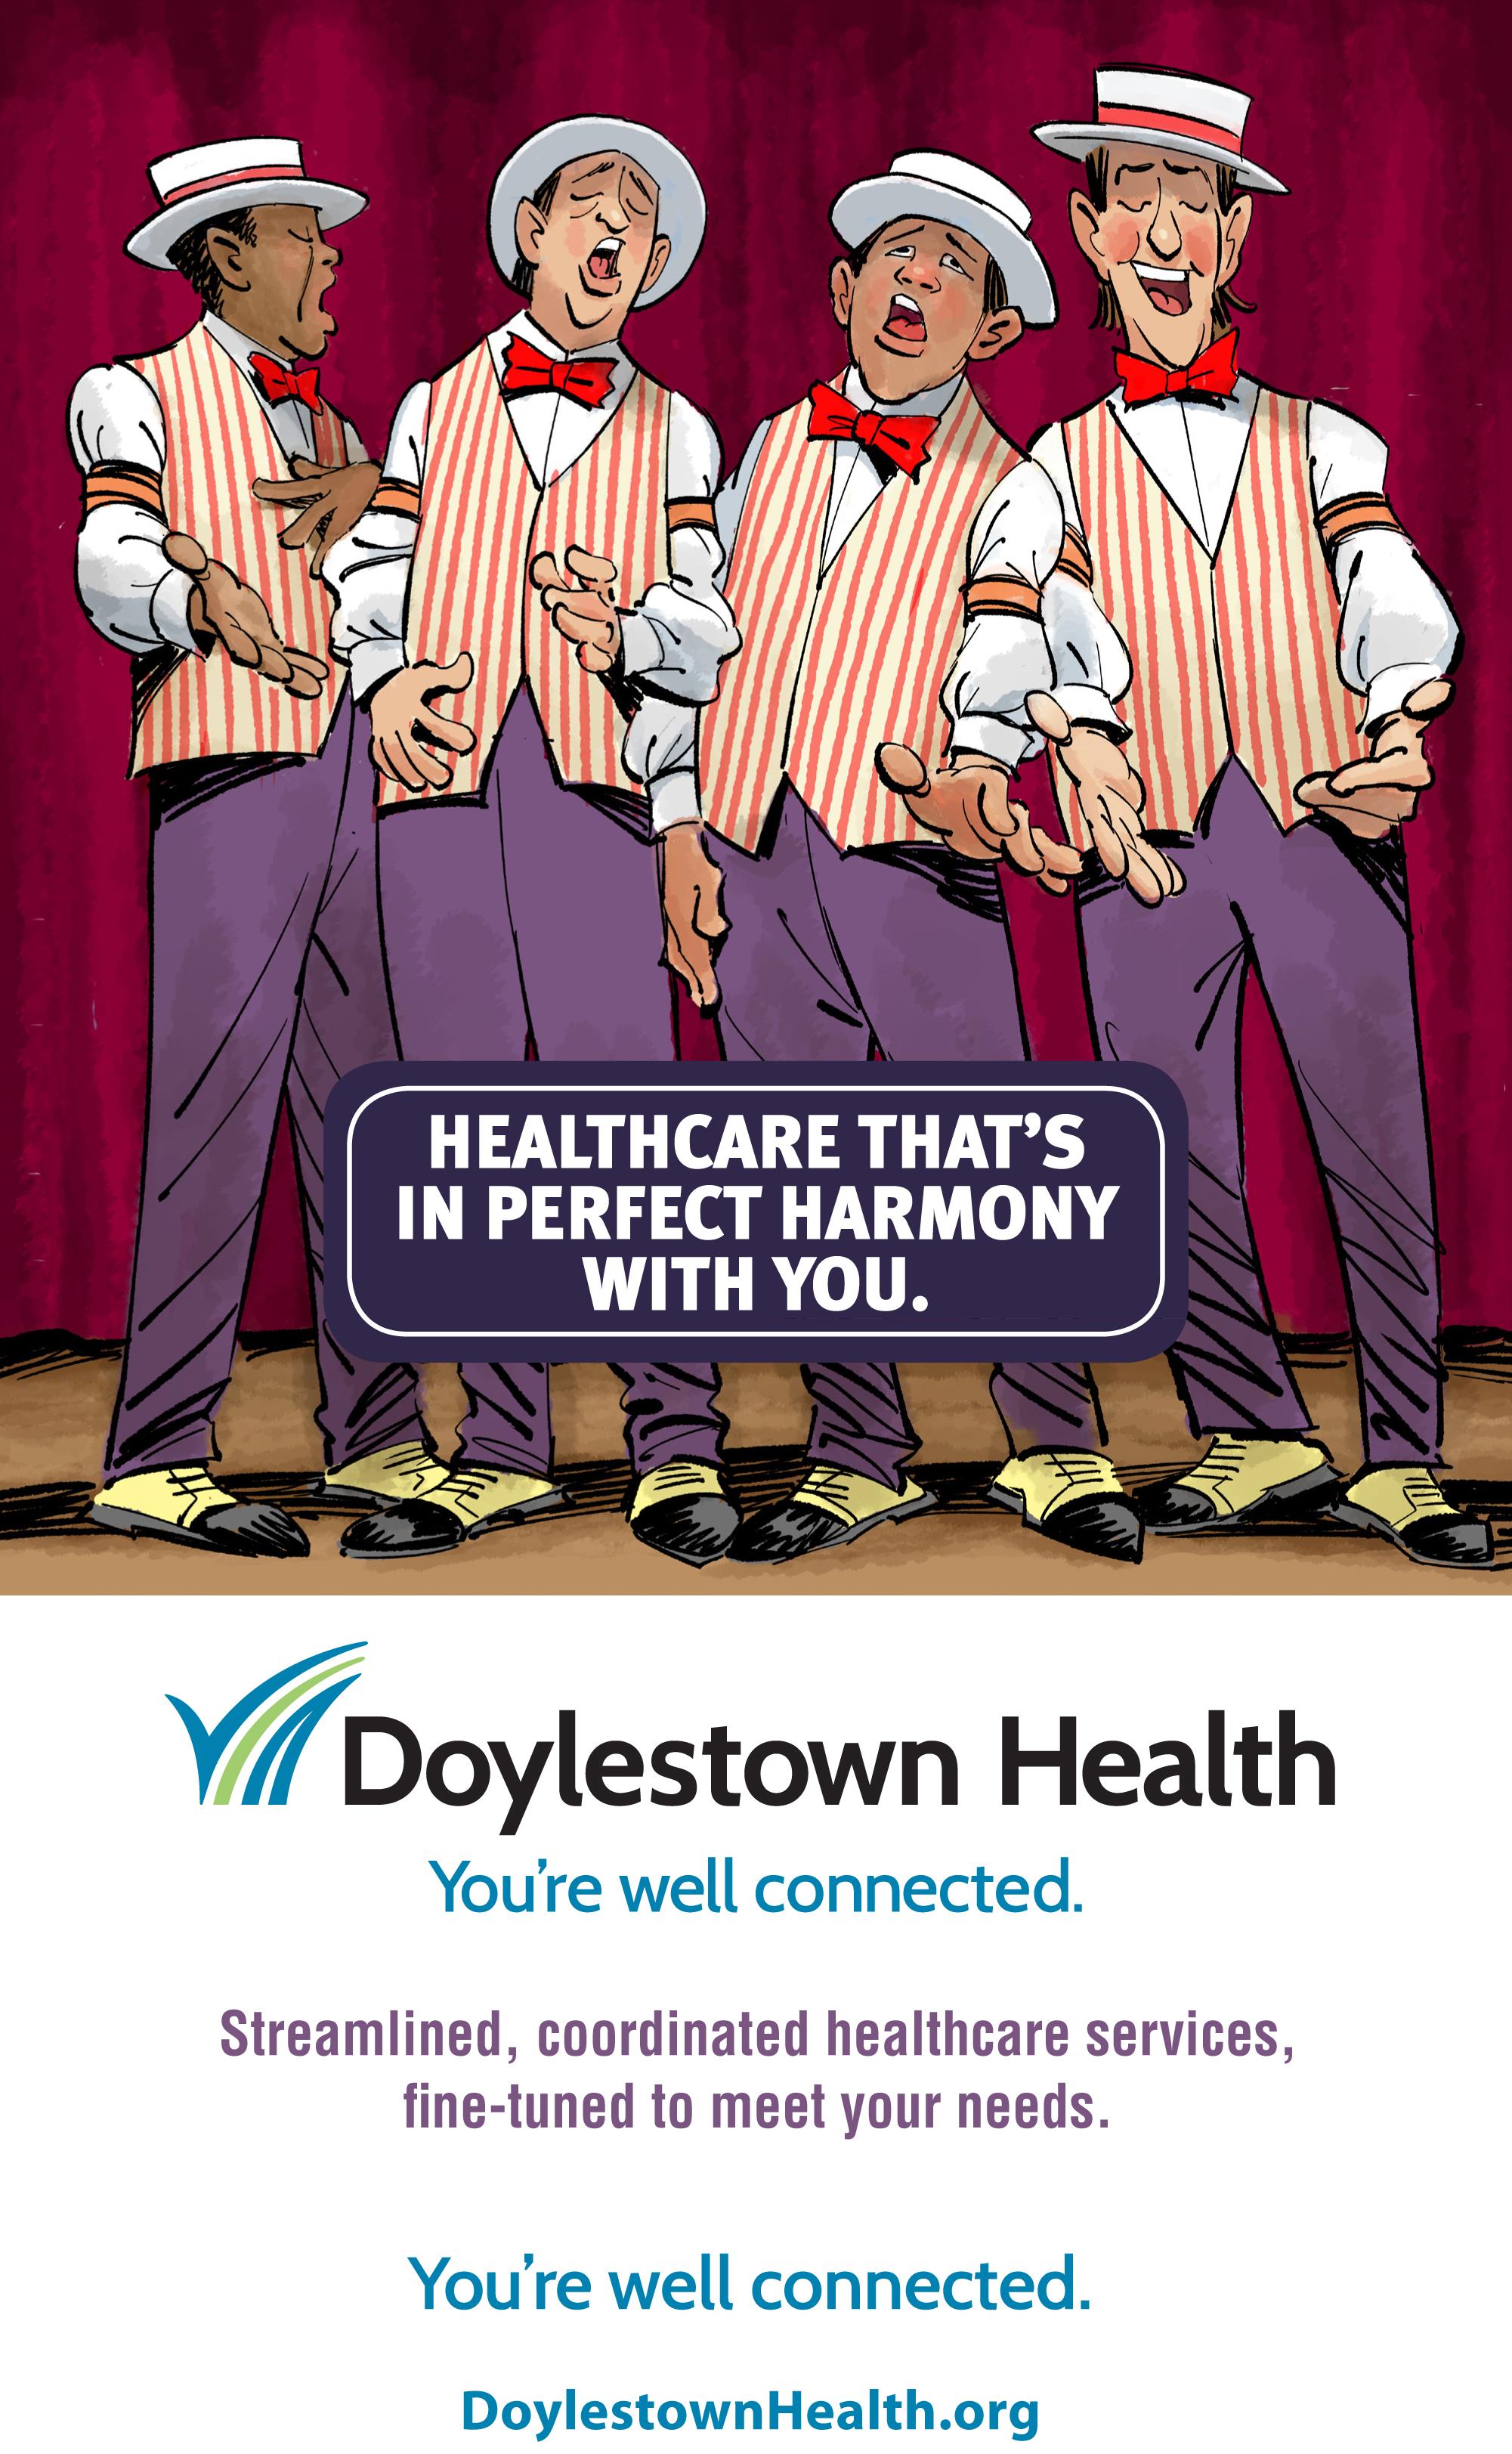 Doylestown Health